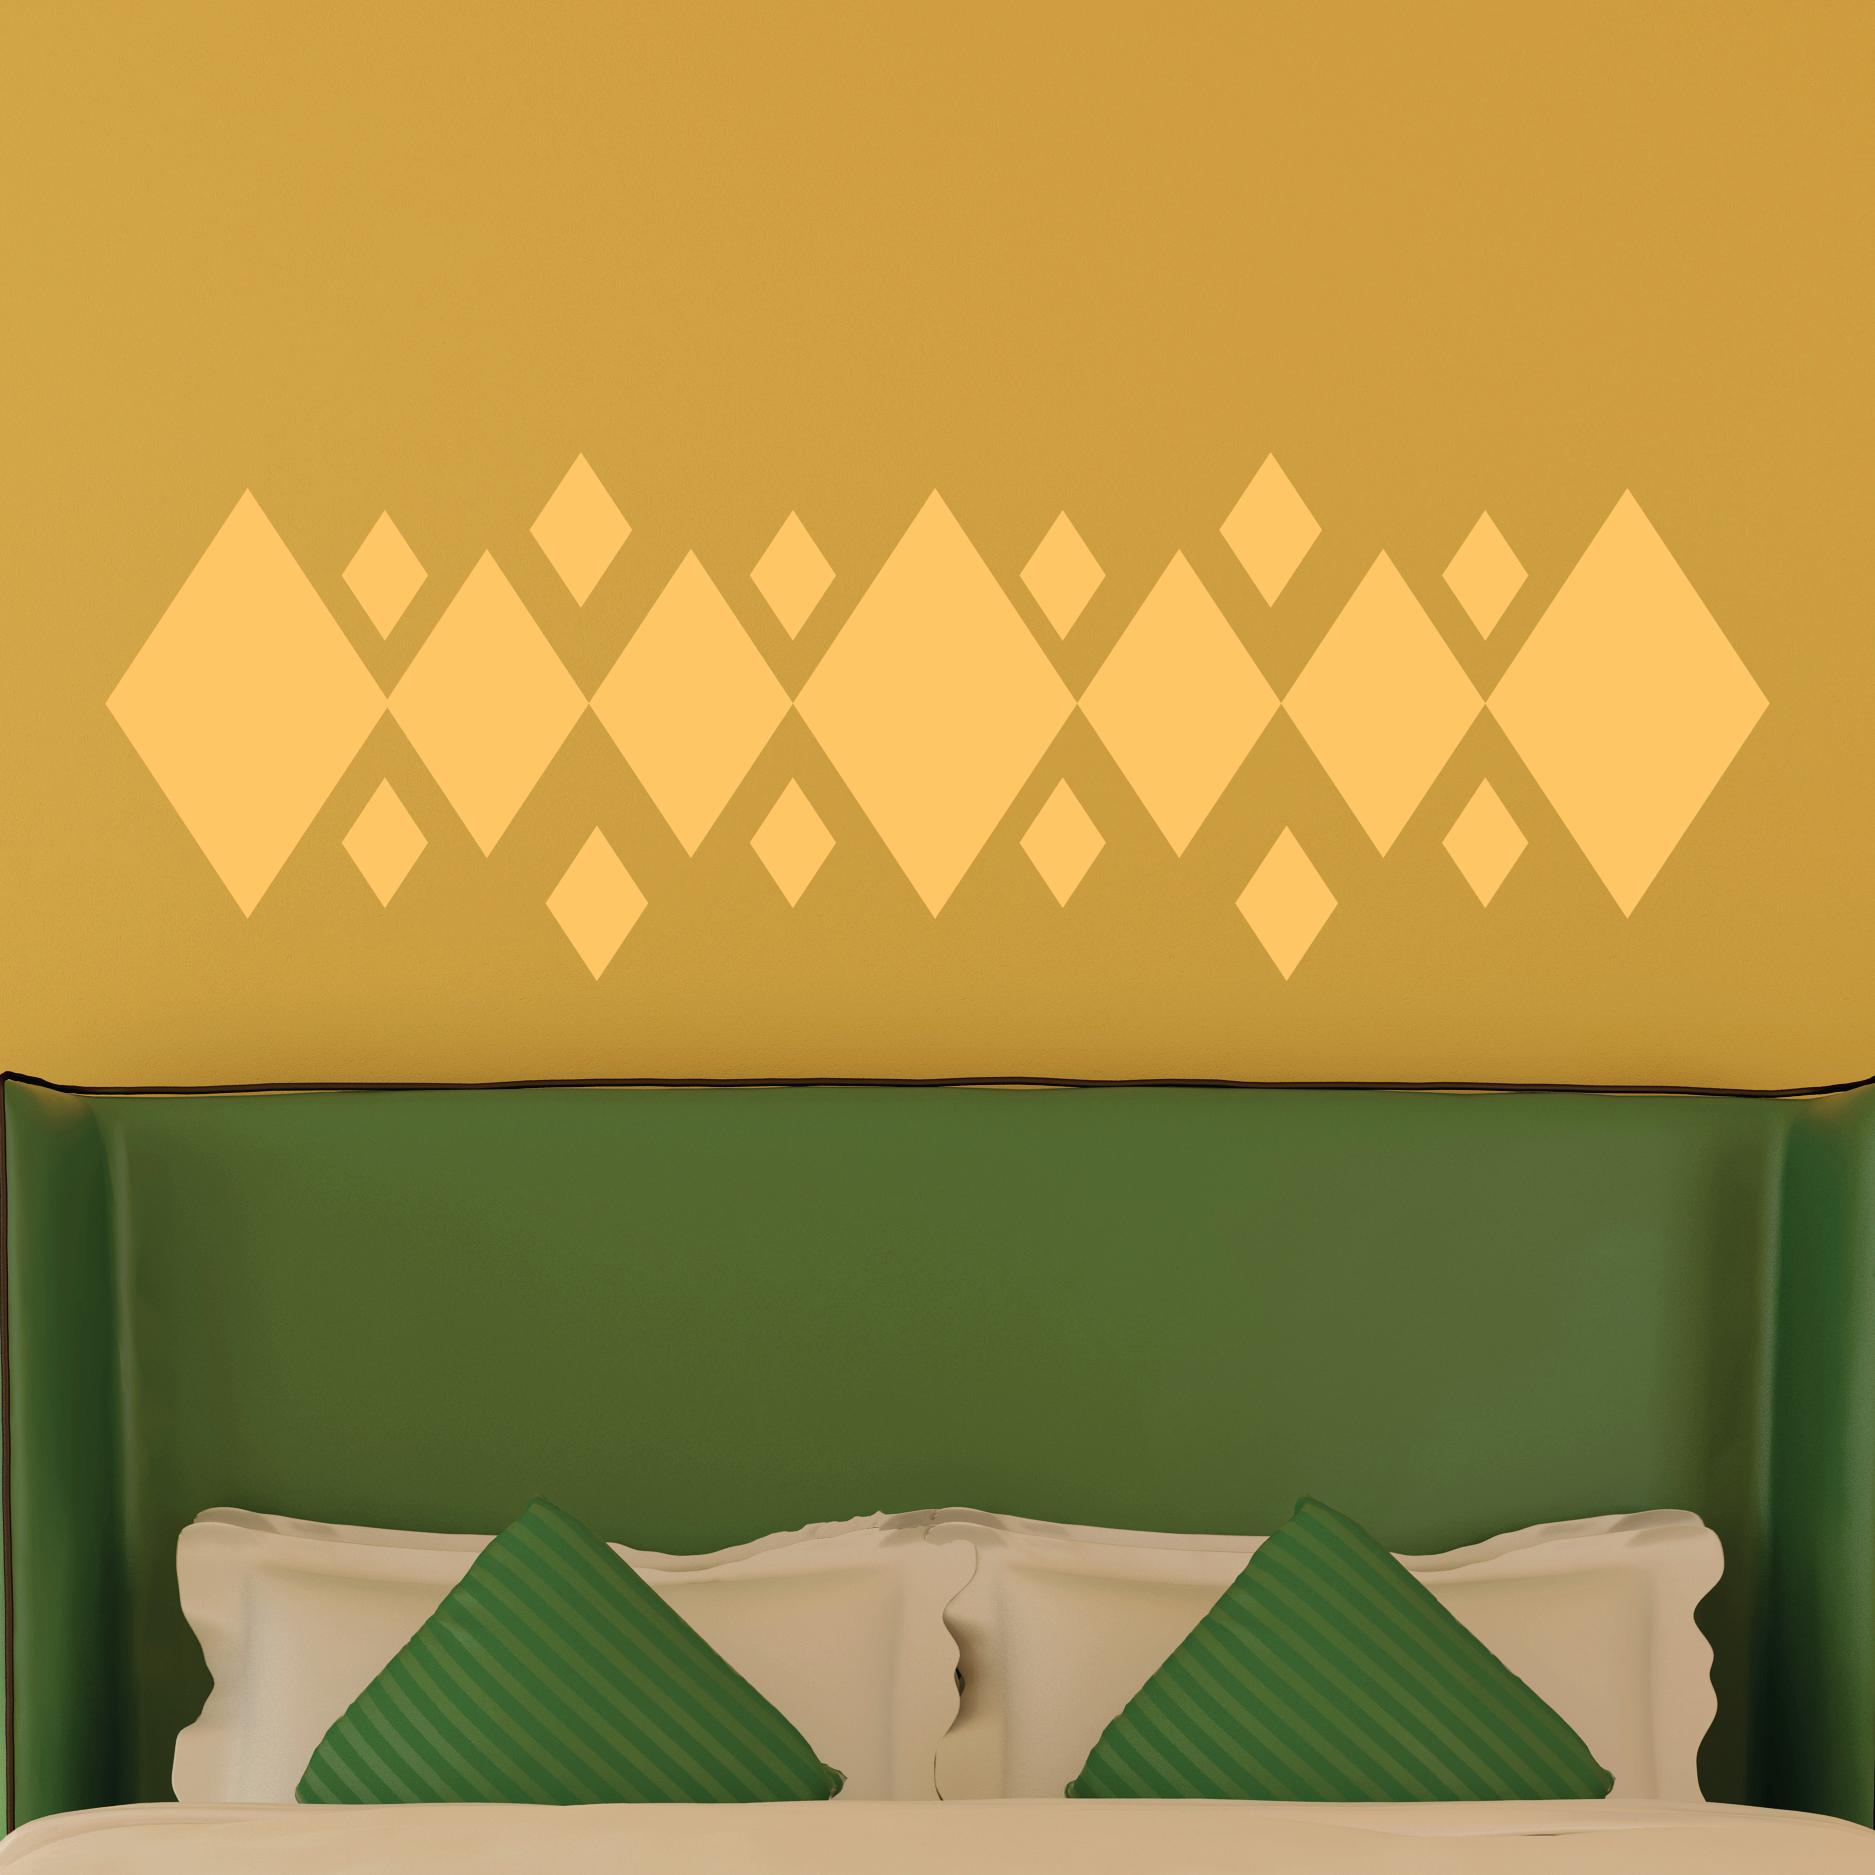 Diamond Headboard Wall Quotes™ Wall Art Decal | WallQuotes.com